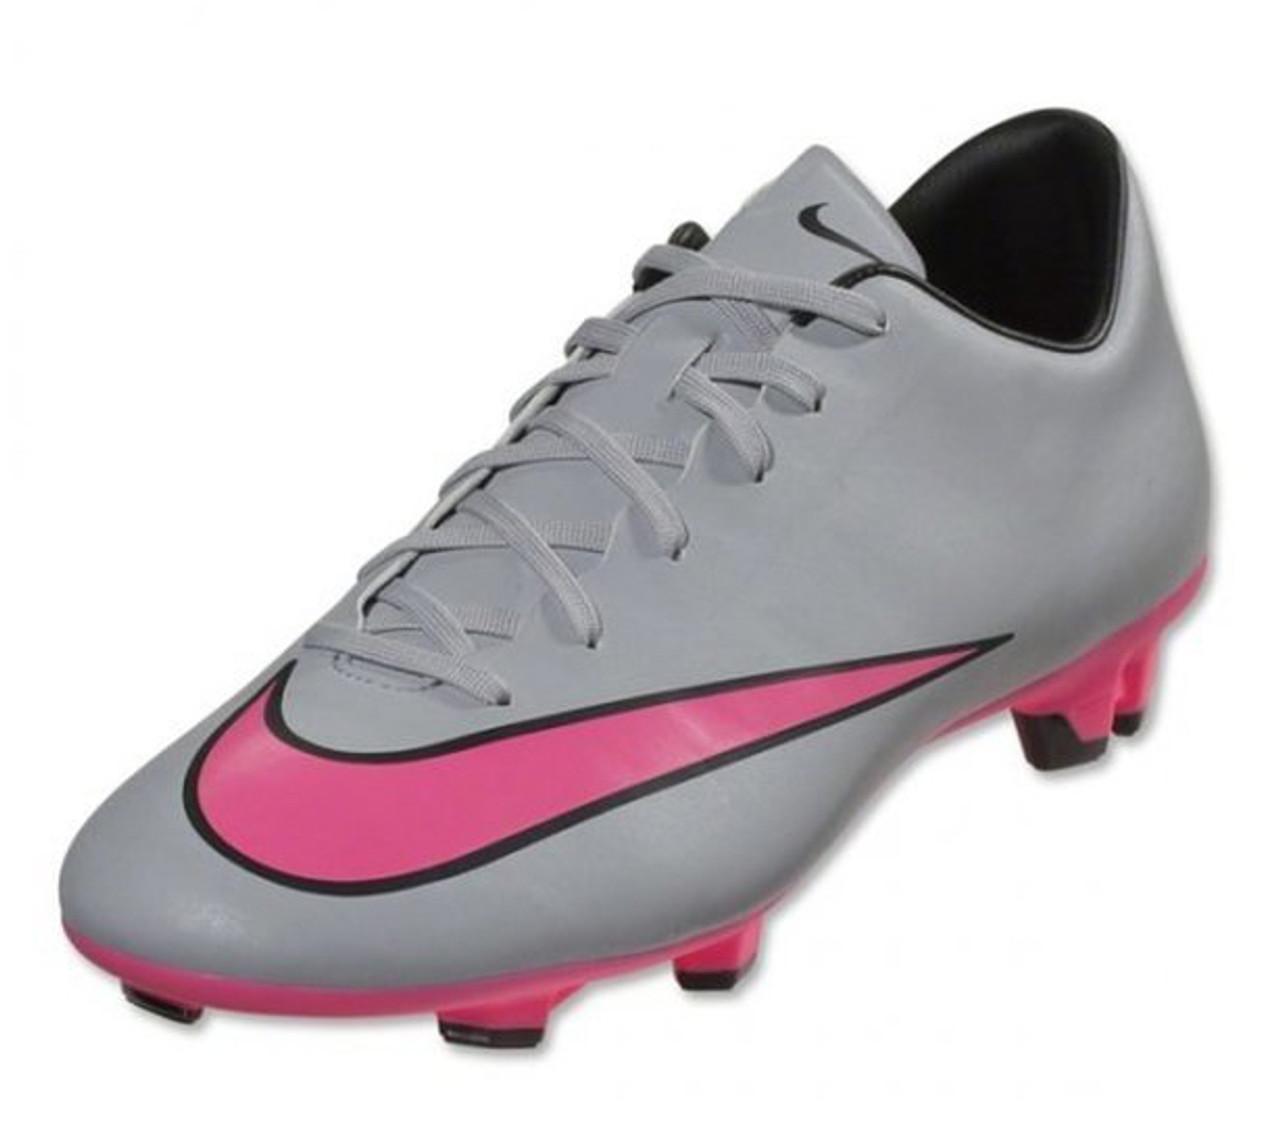 best service 7d12c c9895 Nike Mercurial Victory V FG - Wolf Grey/Black/Hyper Pink SD (032419)